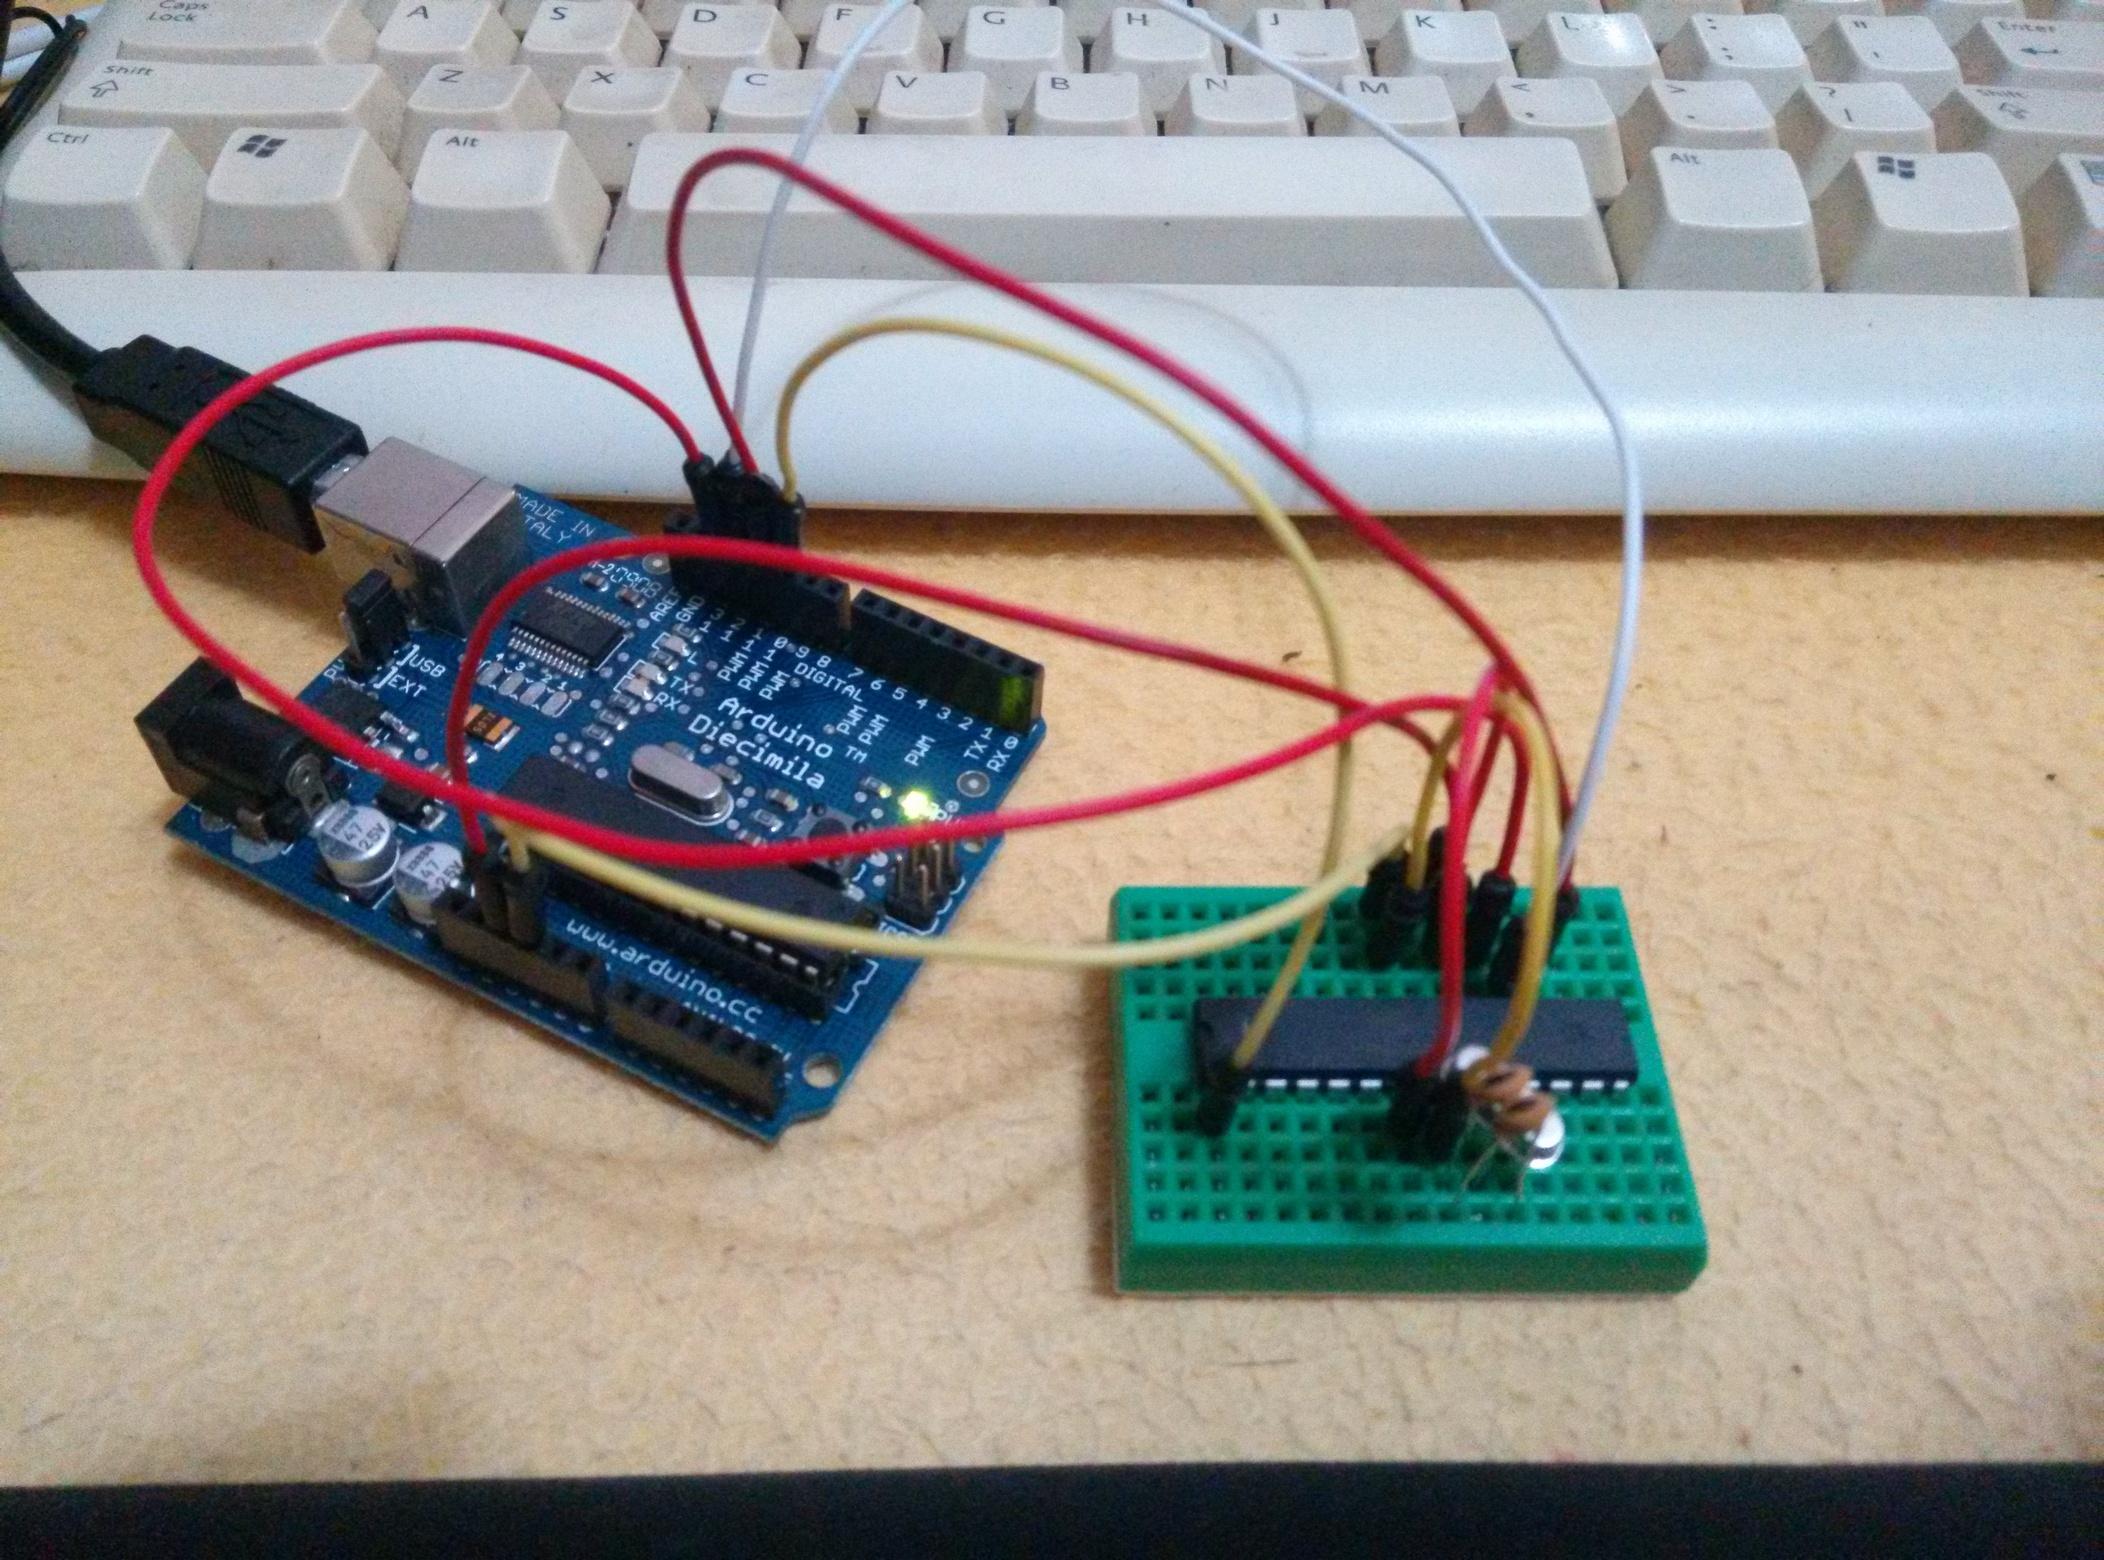 Burn BootLoader into Atmega328P using Arduino Diecimila